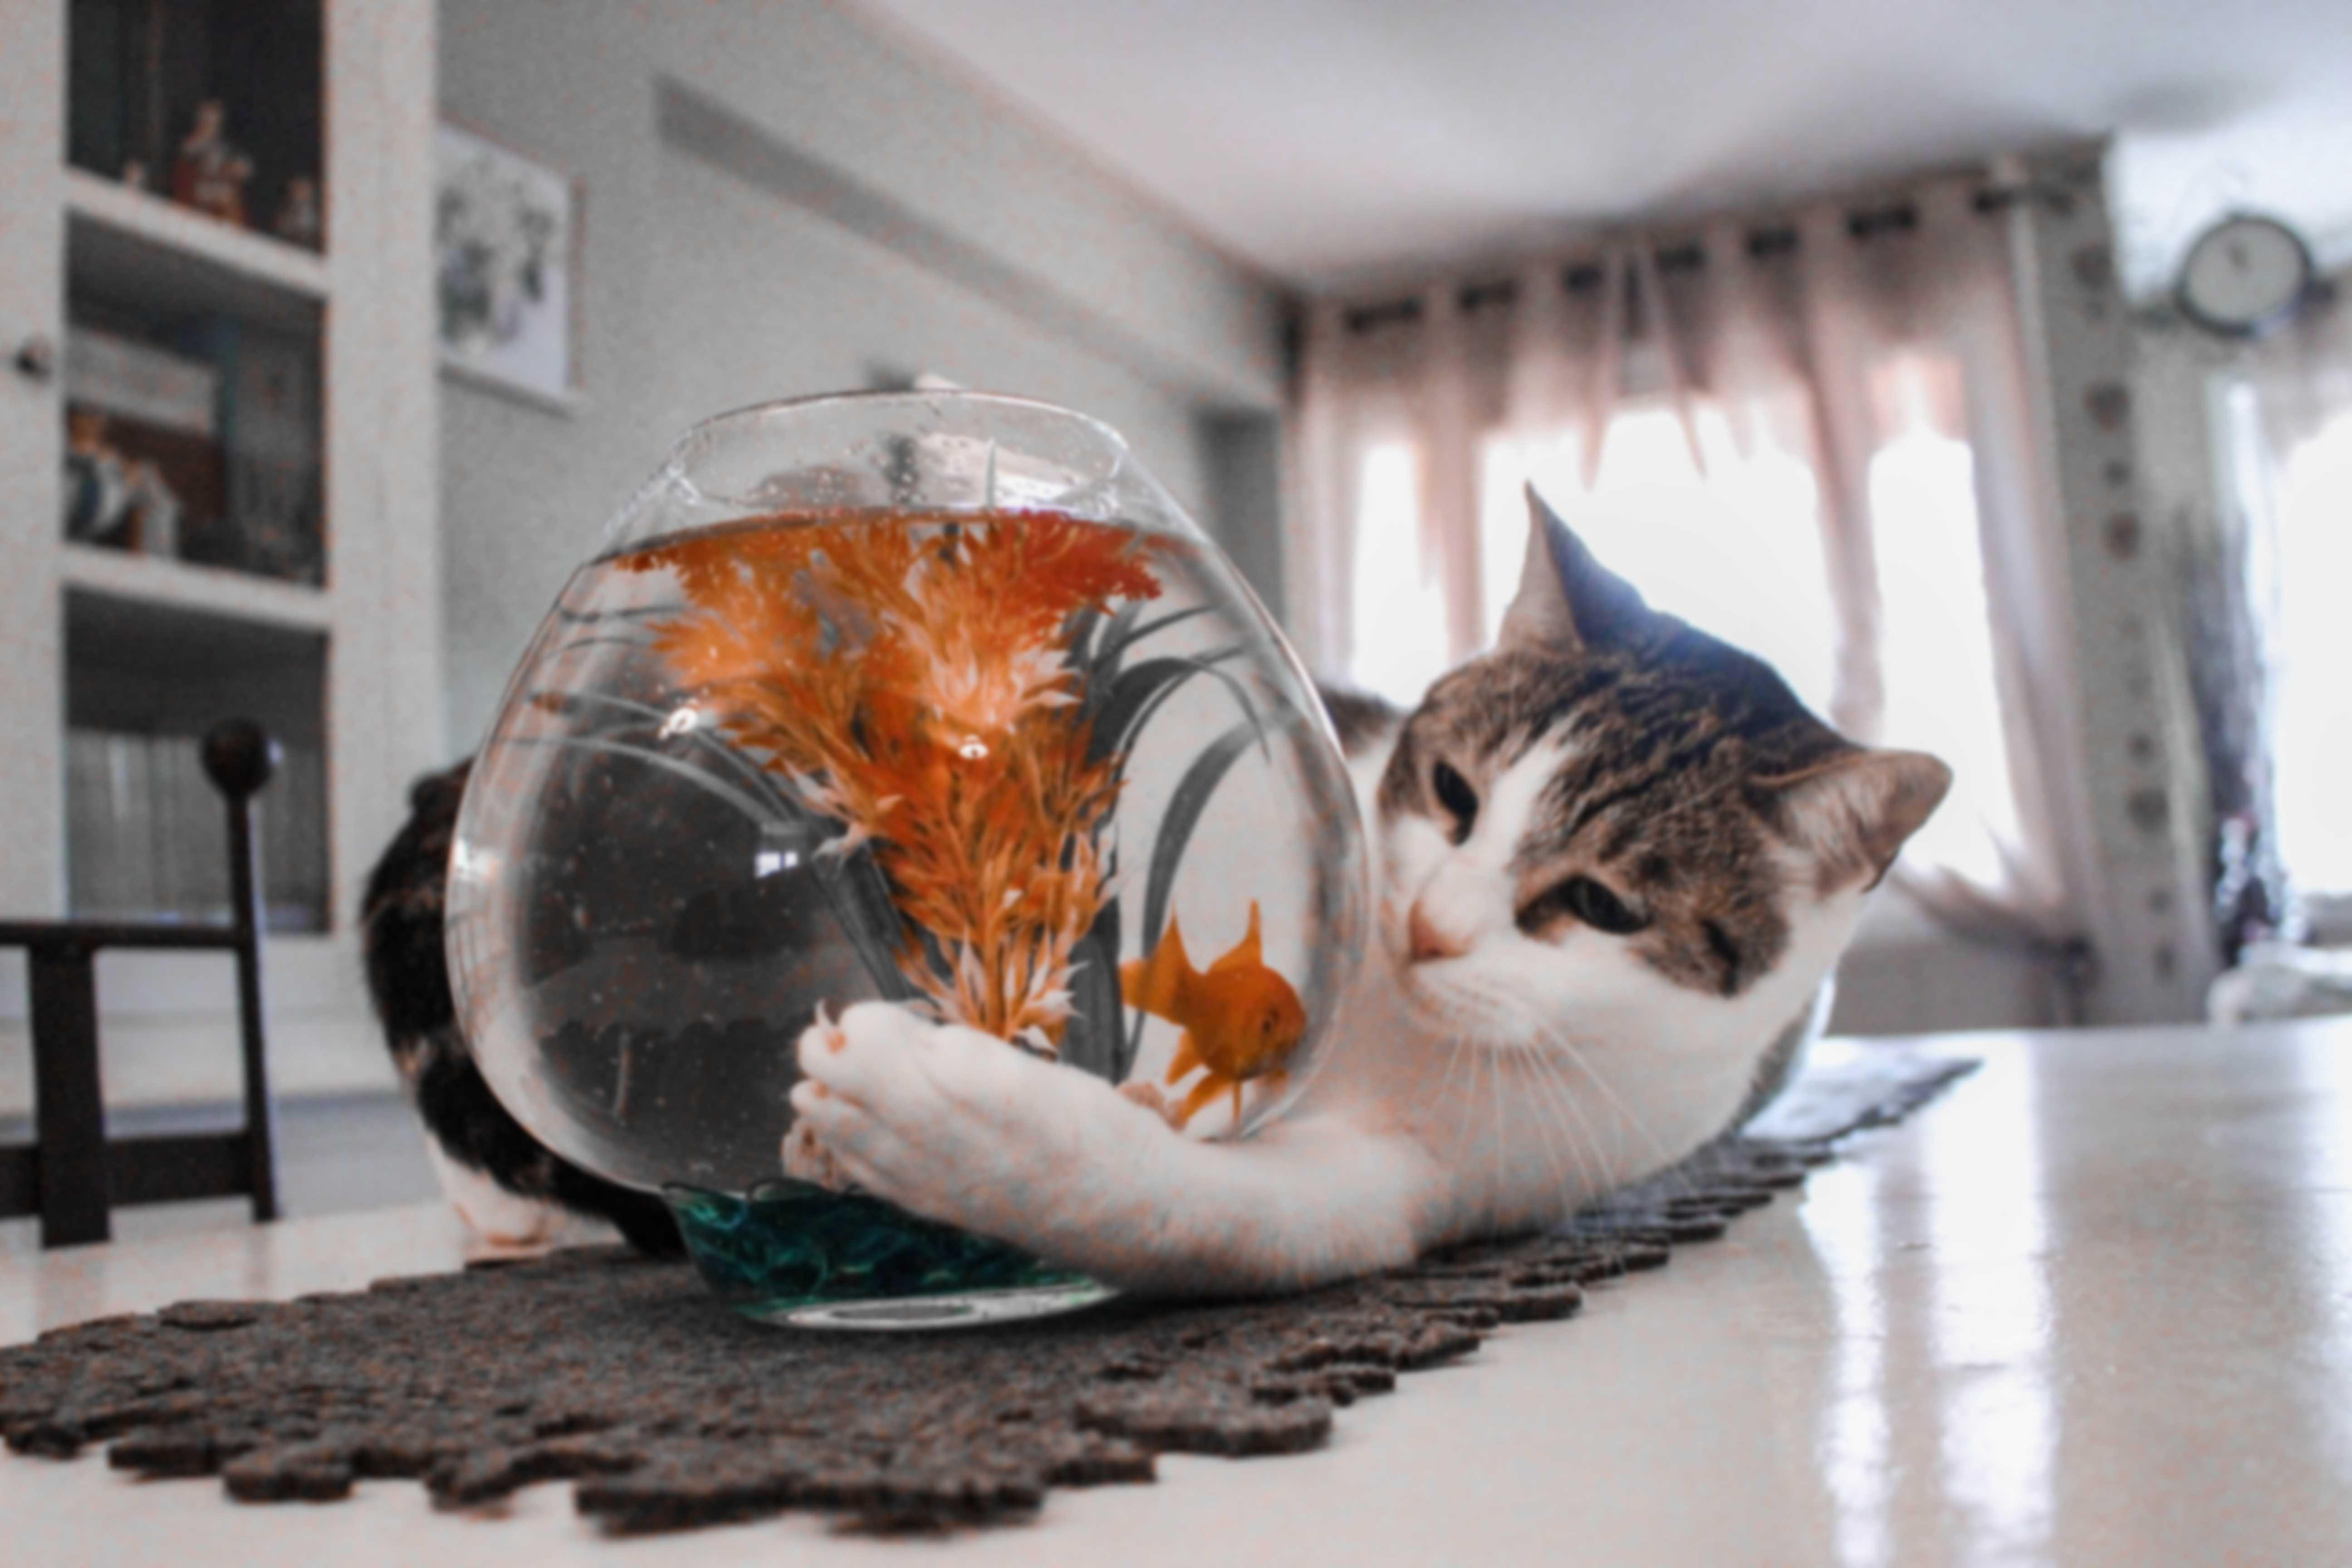 cat looking at fish in bowl